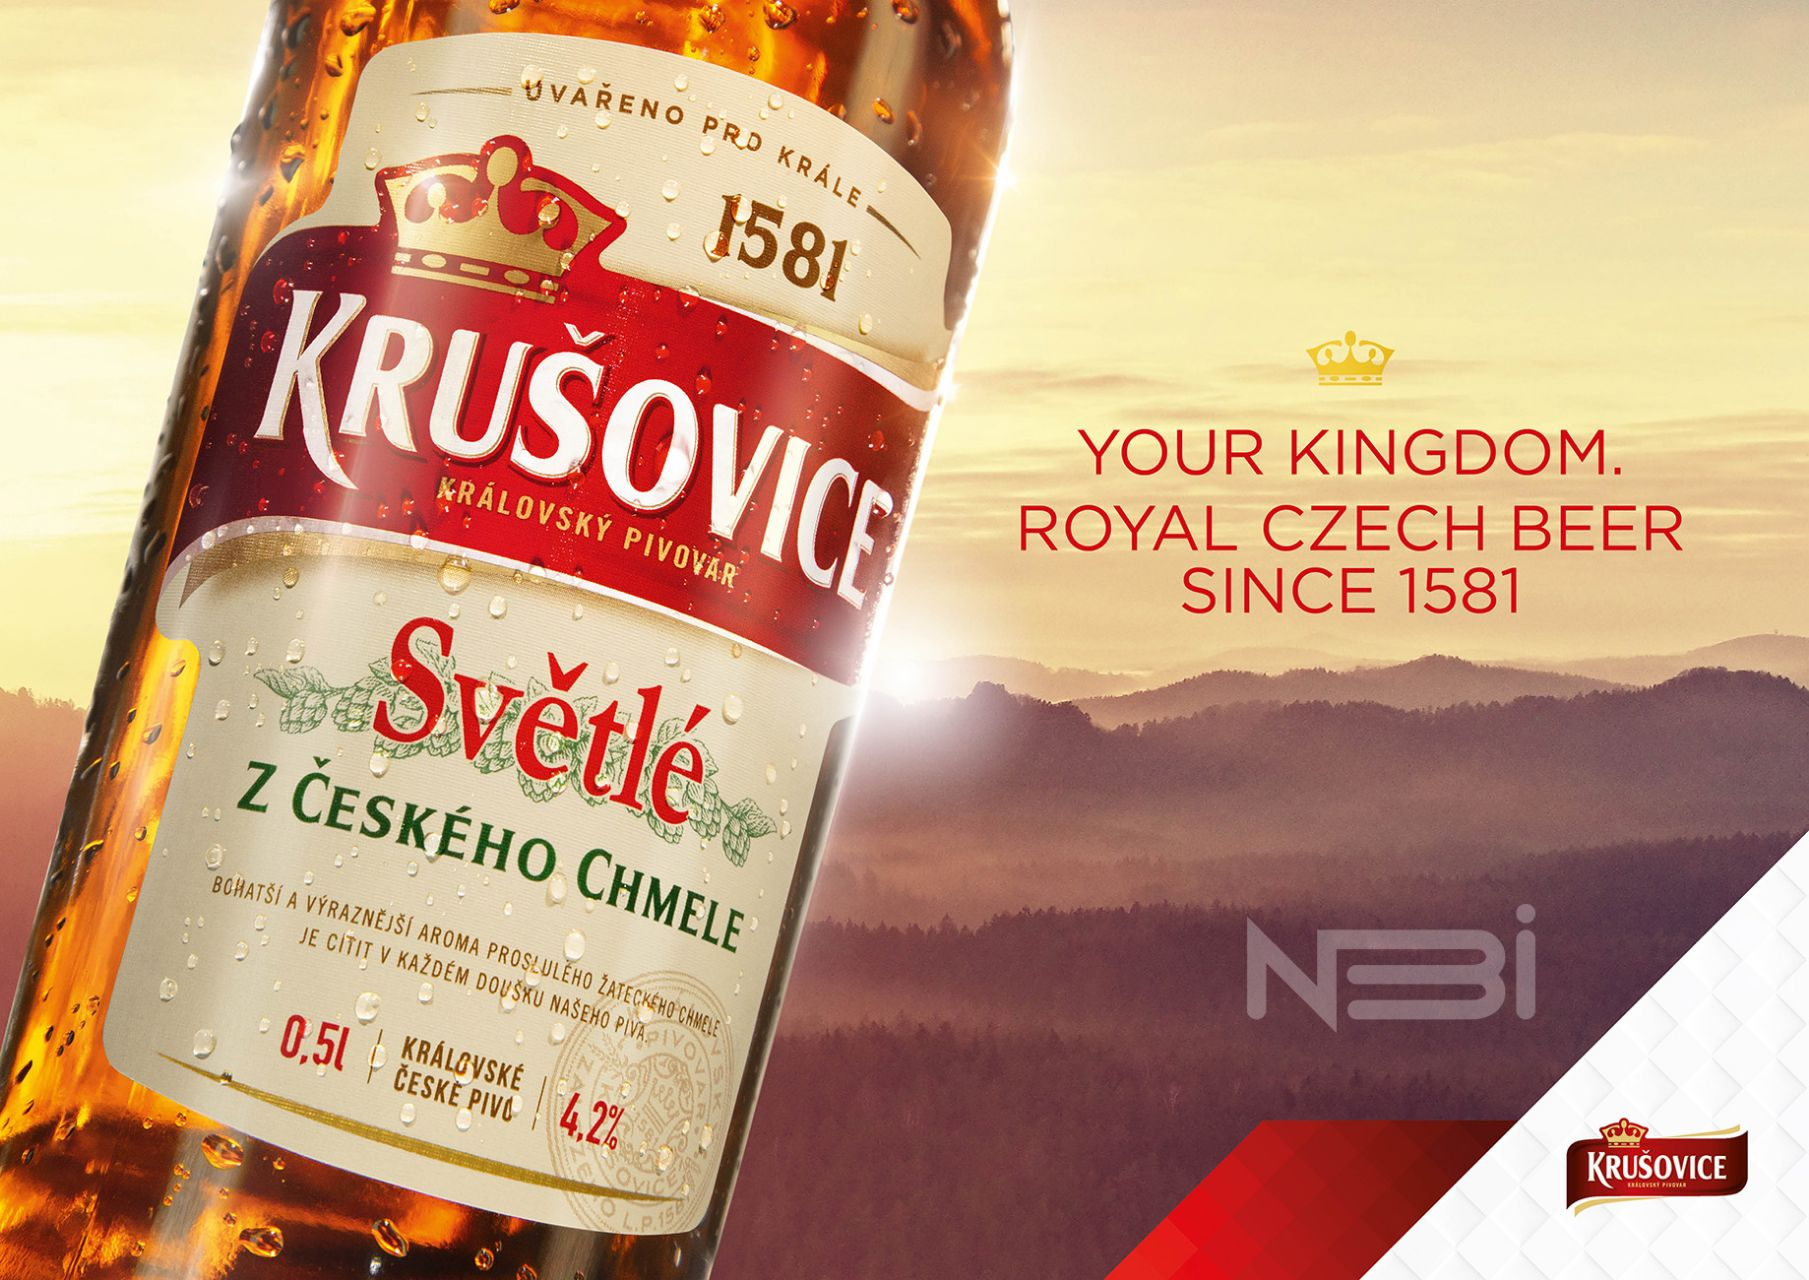 Рекламная фотография бутылки Krusovice для Key Visual